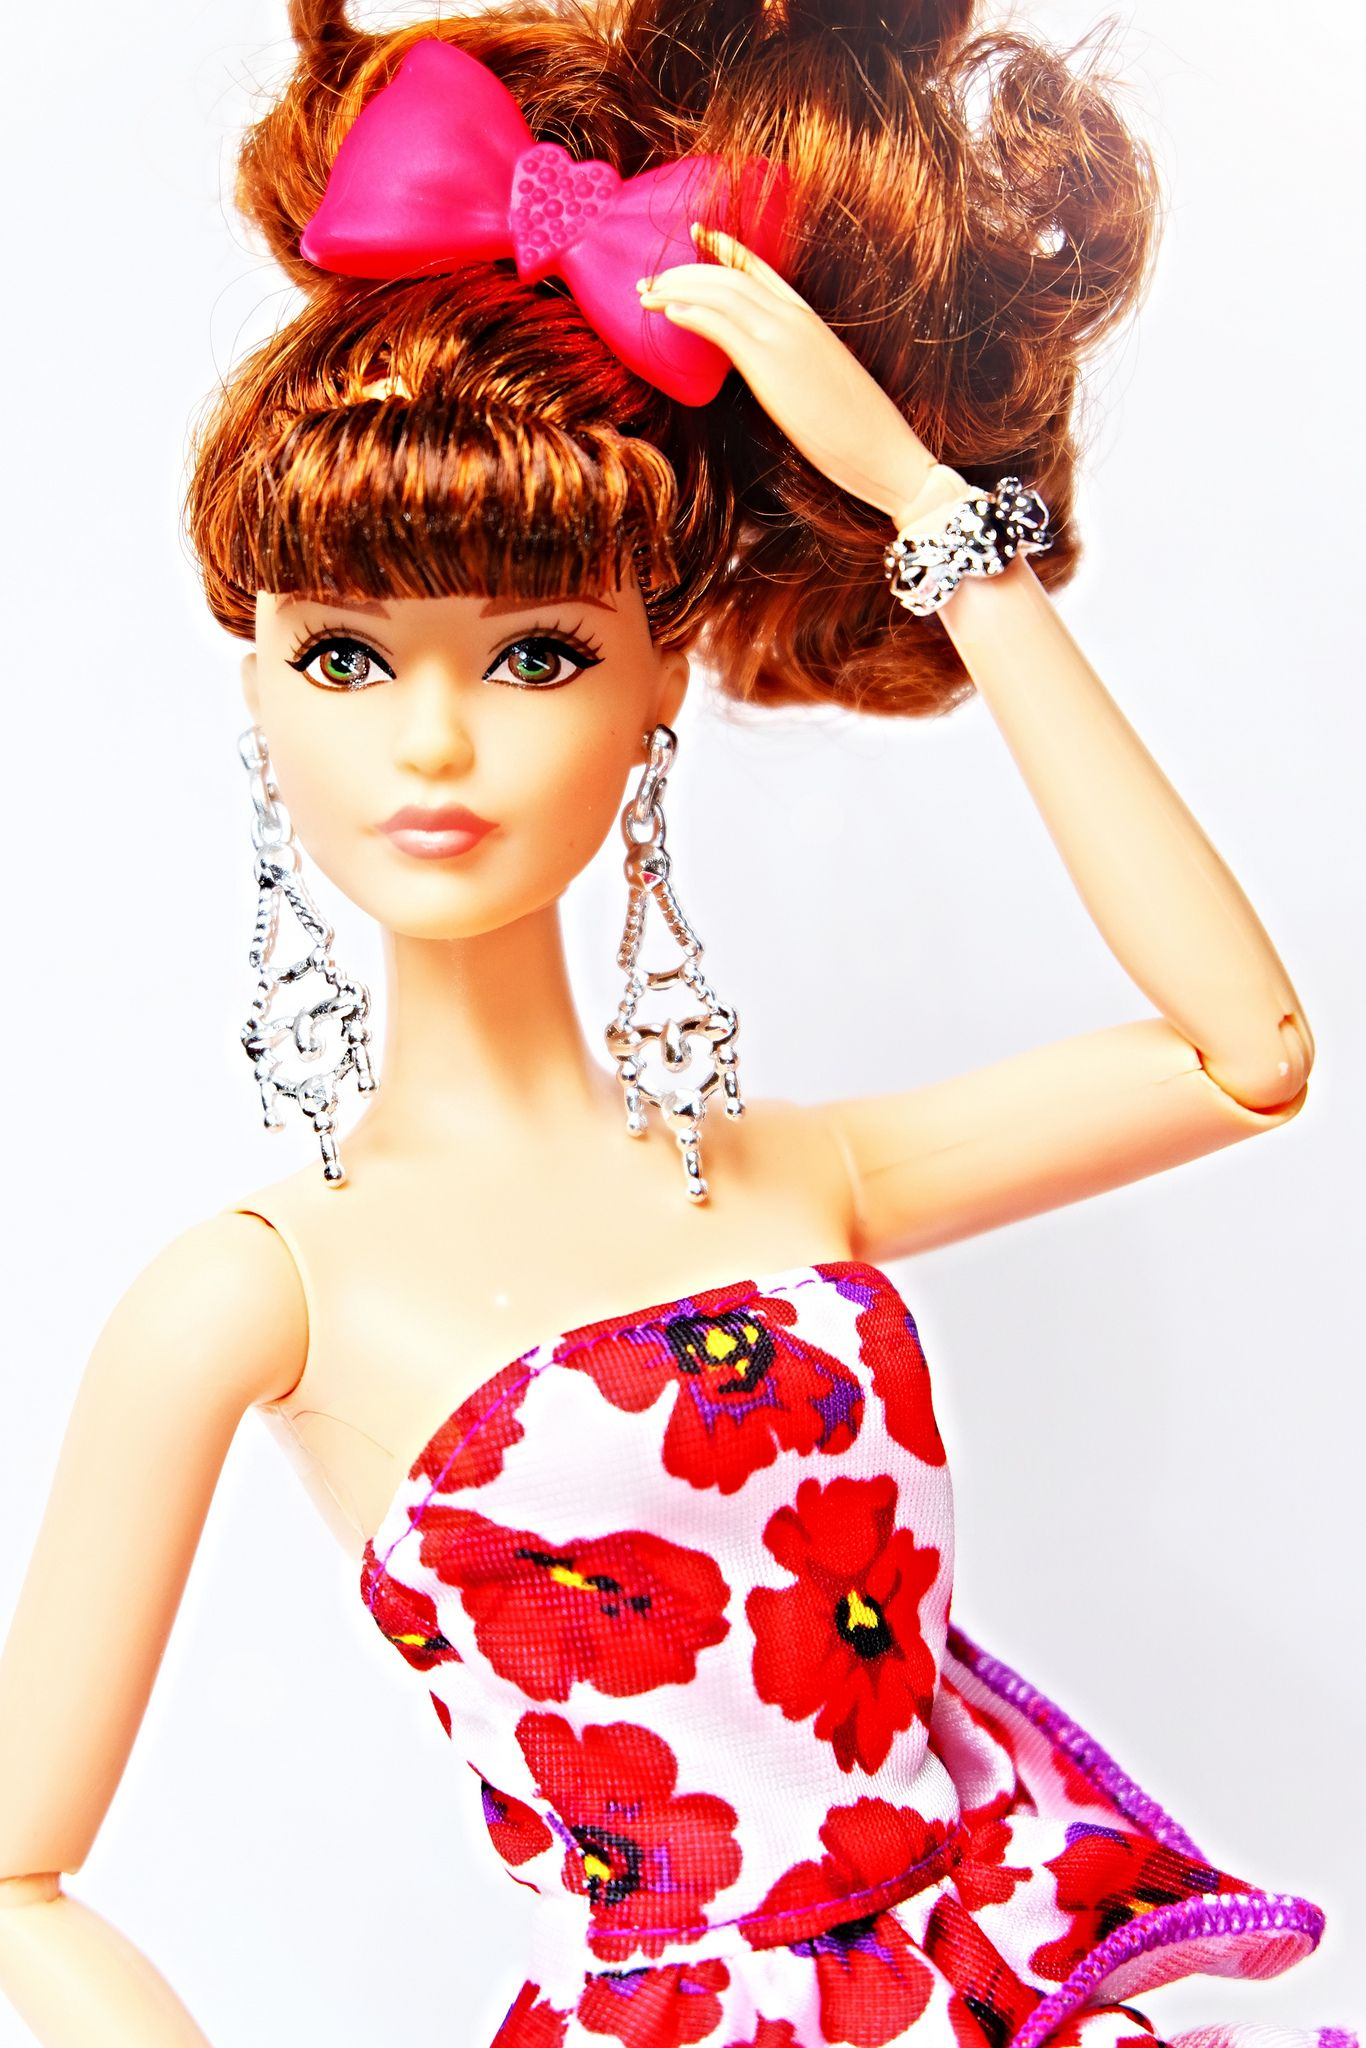 sweet lady barbara millicent roberts pinterest sweet lady rh pinterest com